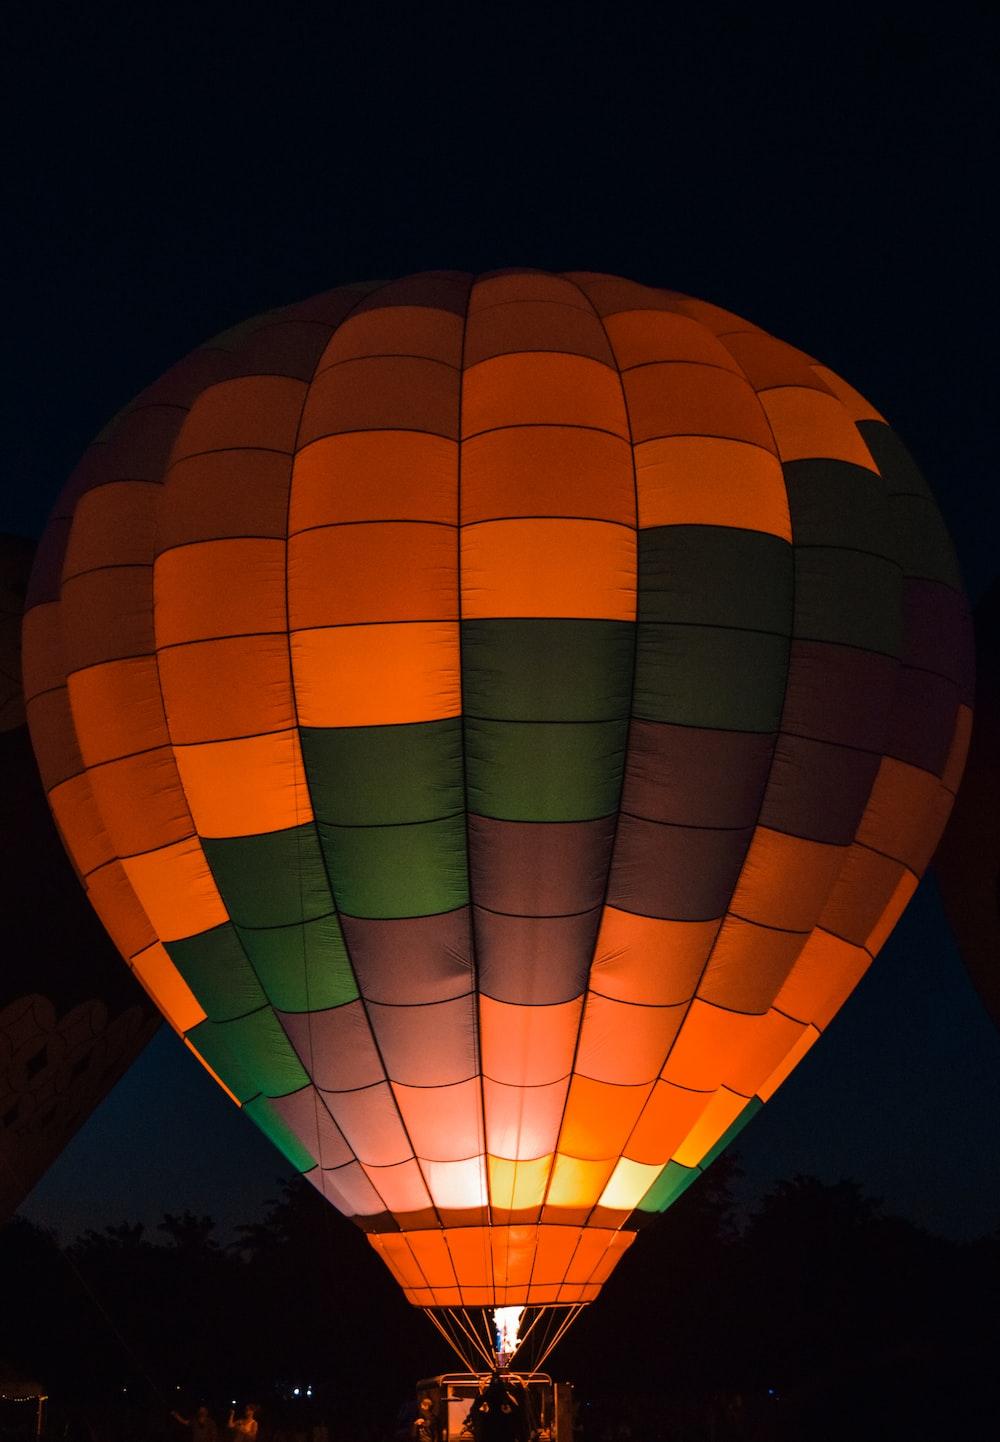 orange and green hot air balloon